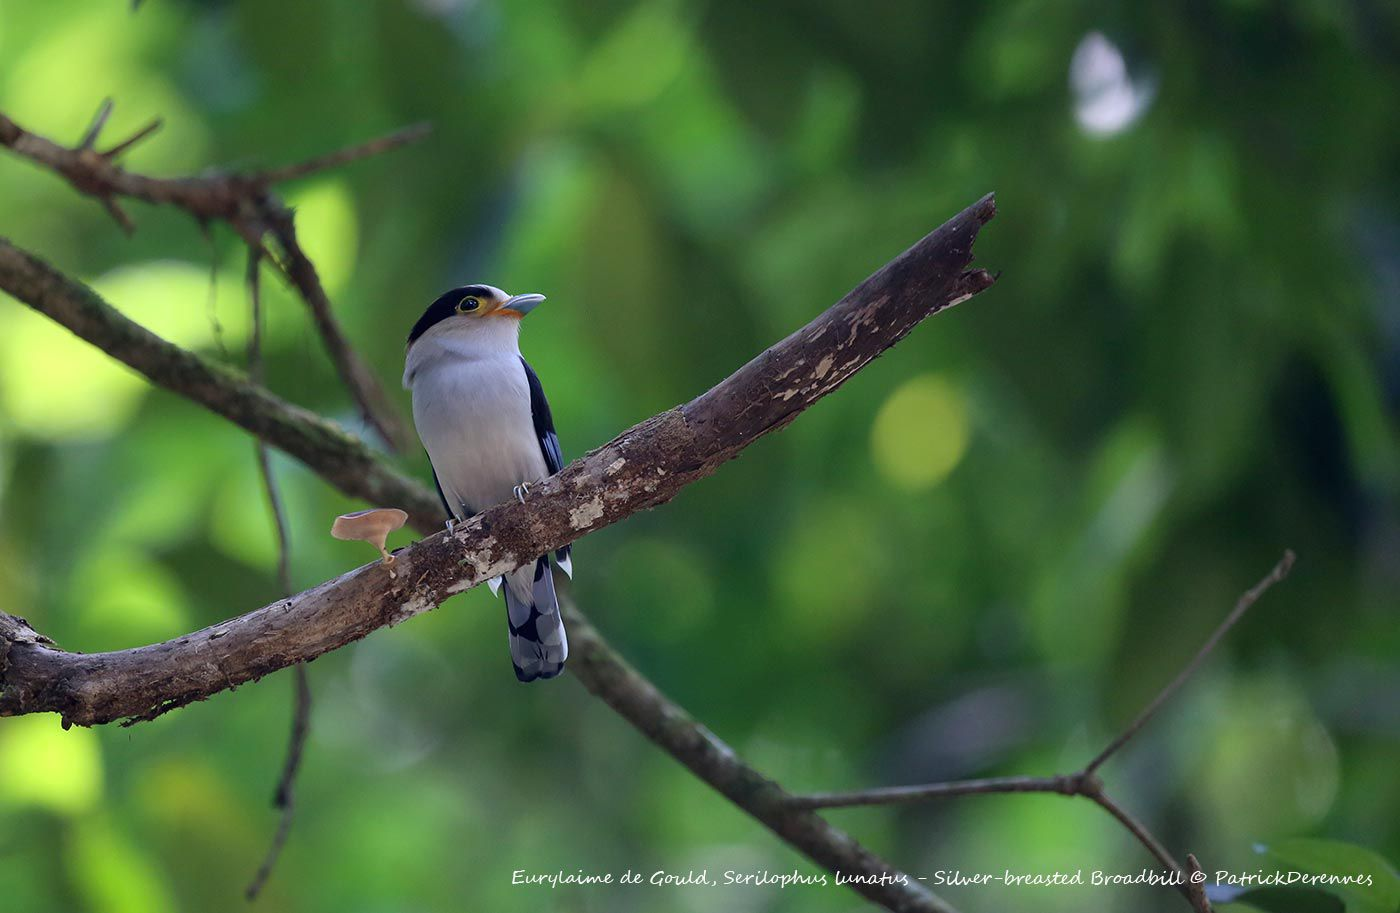 Thaïlande 2014 - Eurylaime de Gould